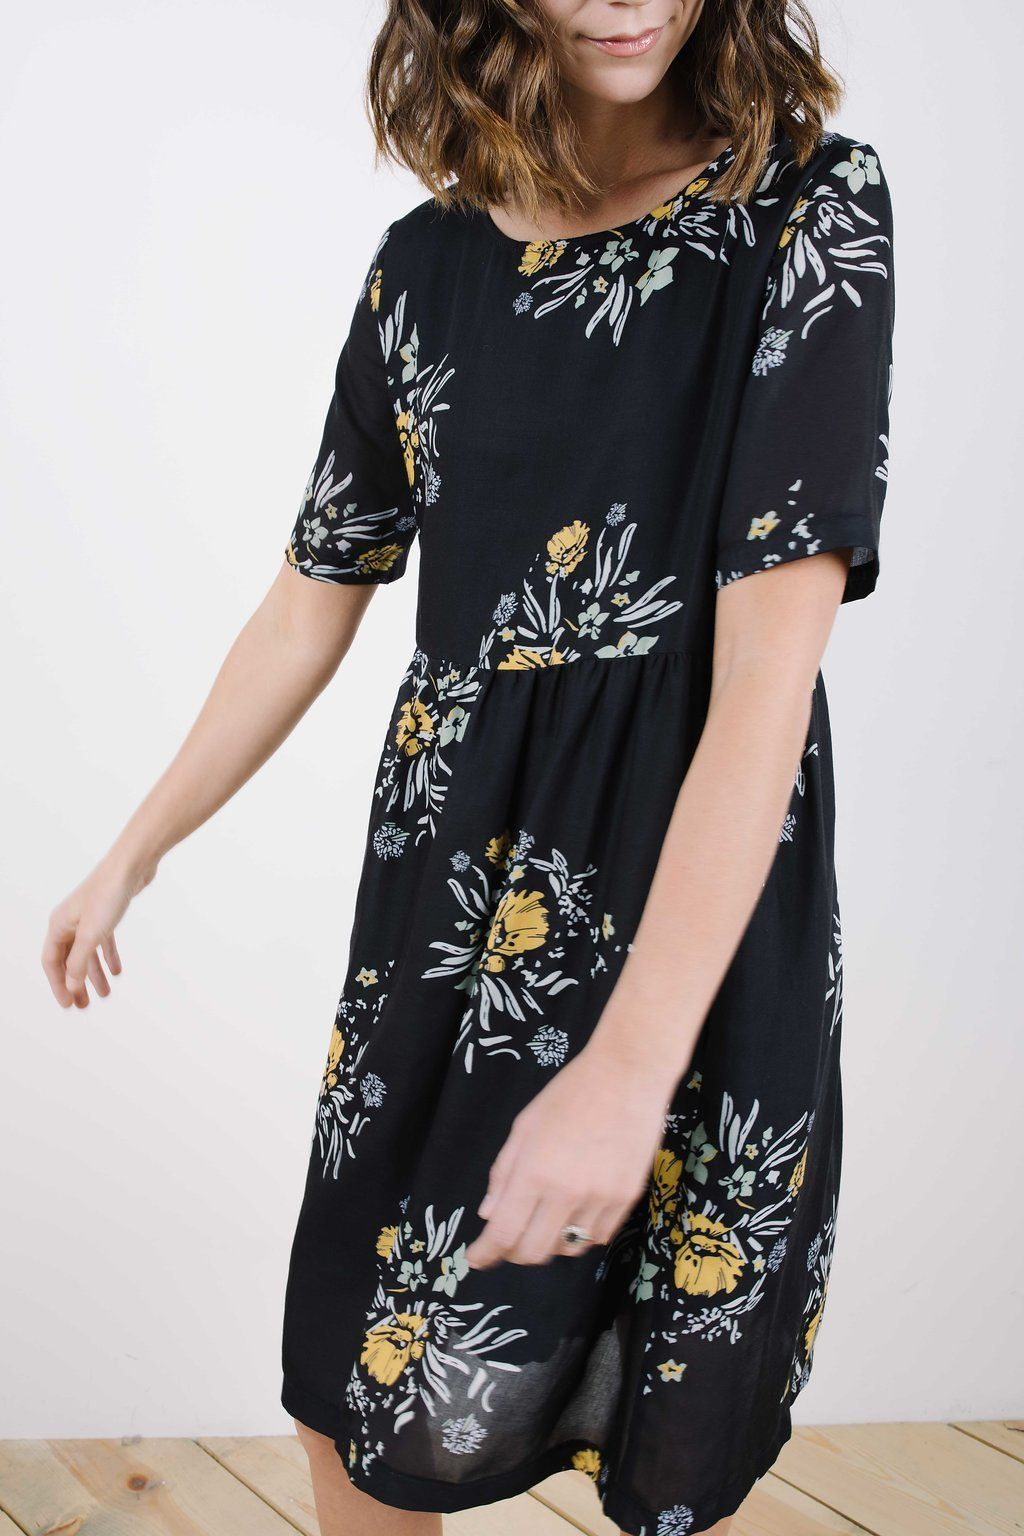 Piper Scoot The Swenson Floral Dress Dresses Nursing Friendly Dress Darling Dress [ 1536 x 1024 Pixel ]